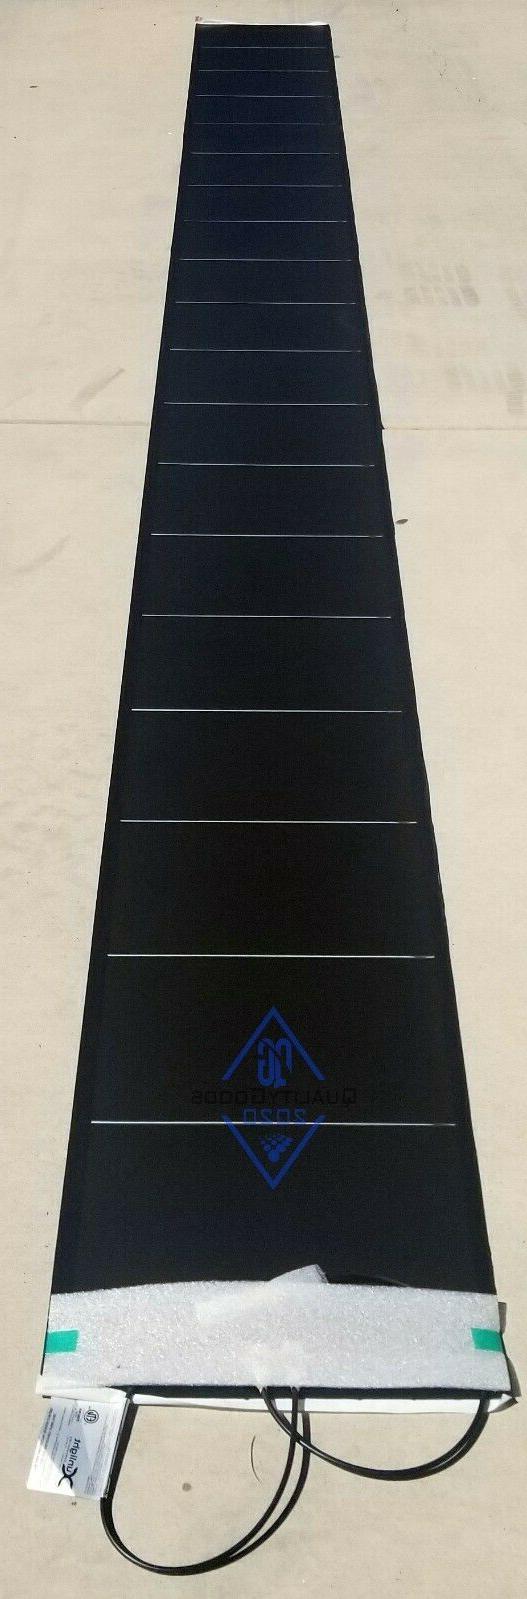 158 watt made in usa flexible solar